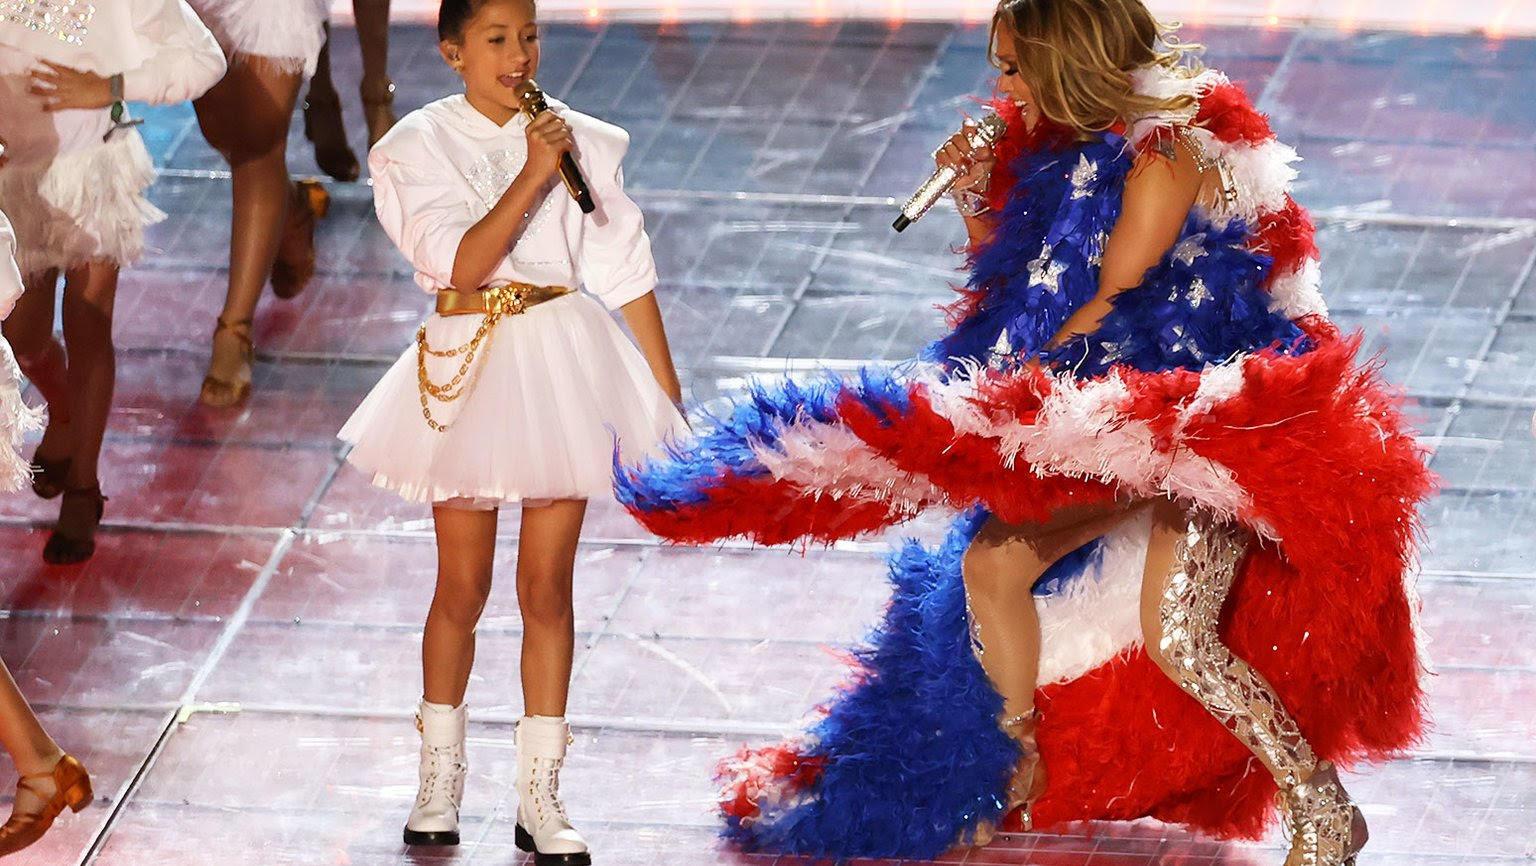 JLo & Shakira Headlined Super Bowl Half-Time Show